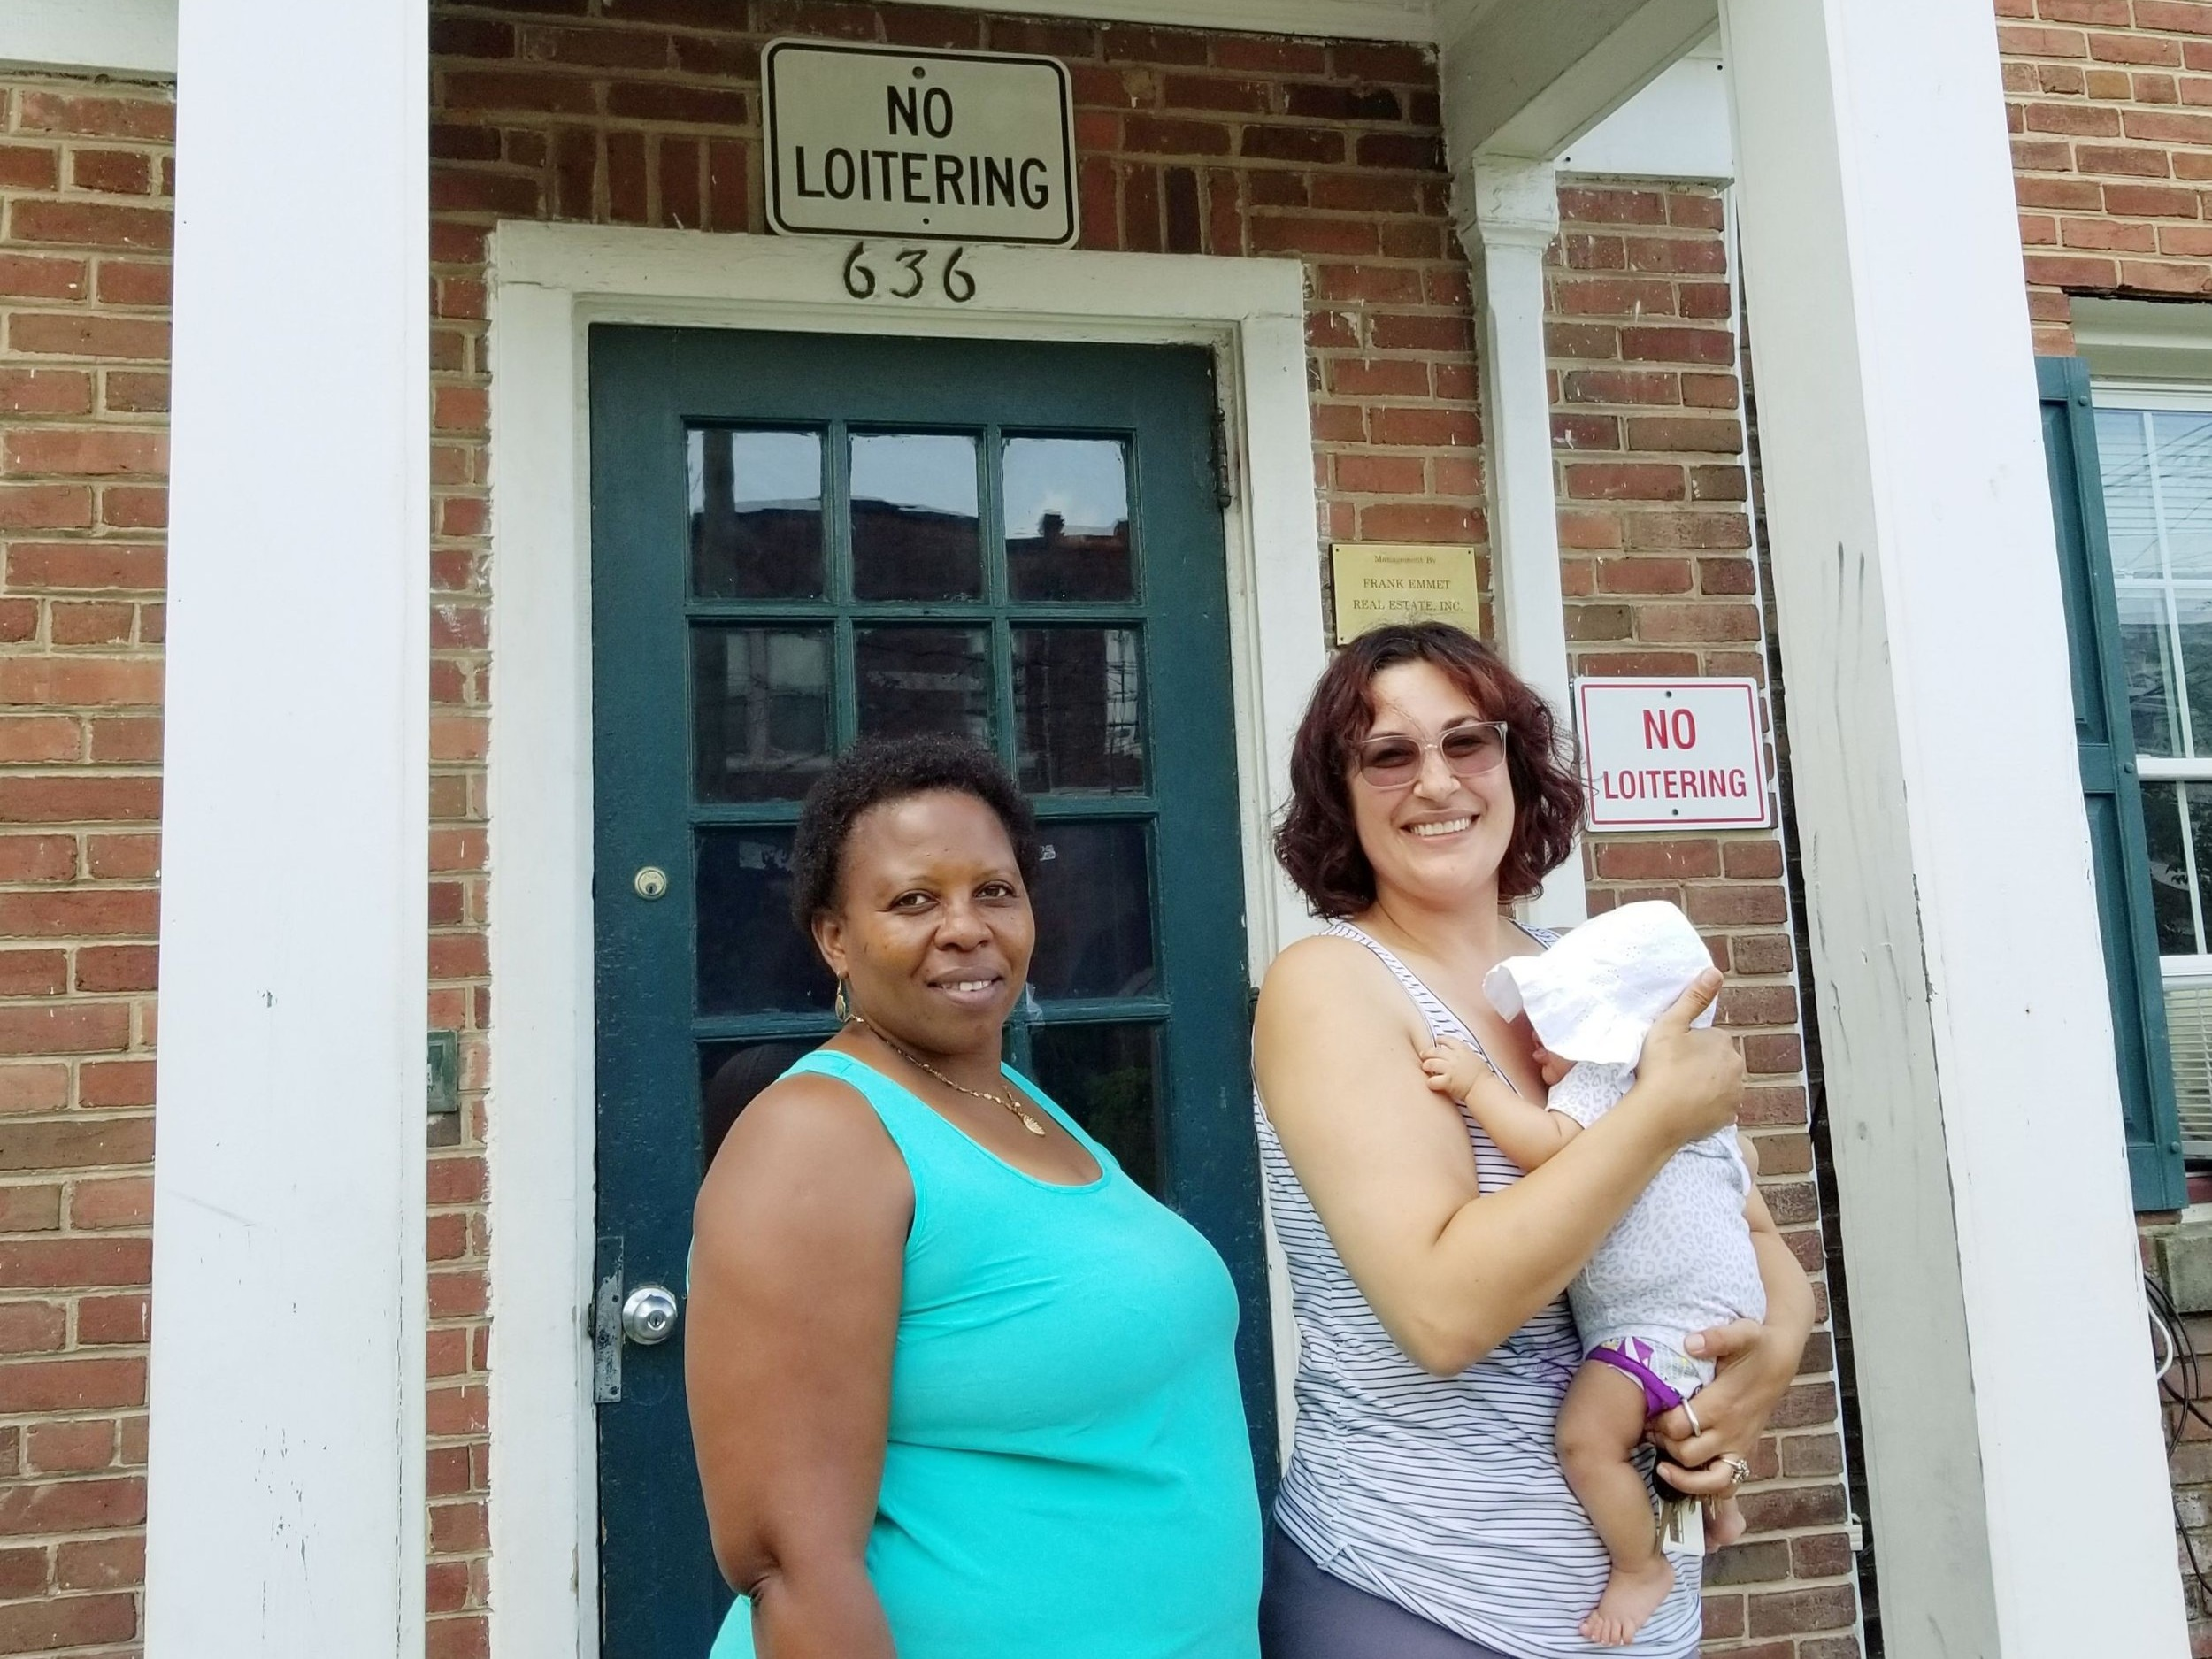 Residents Joy Hazuka and Heather Benno, members of the 636 Girard St. NE Tenants Association